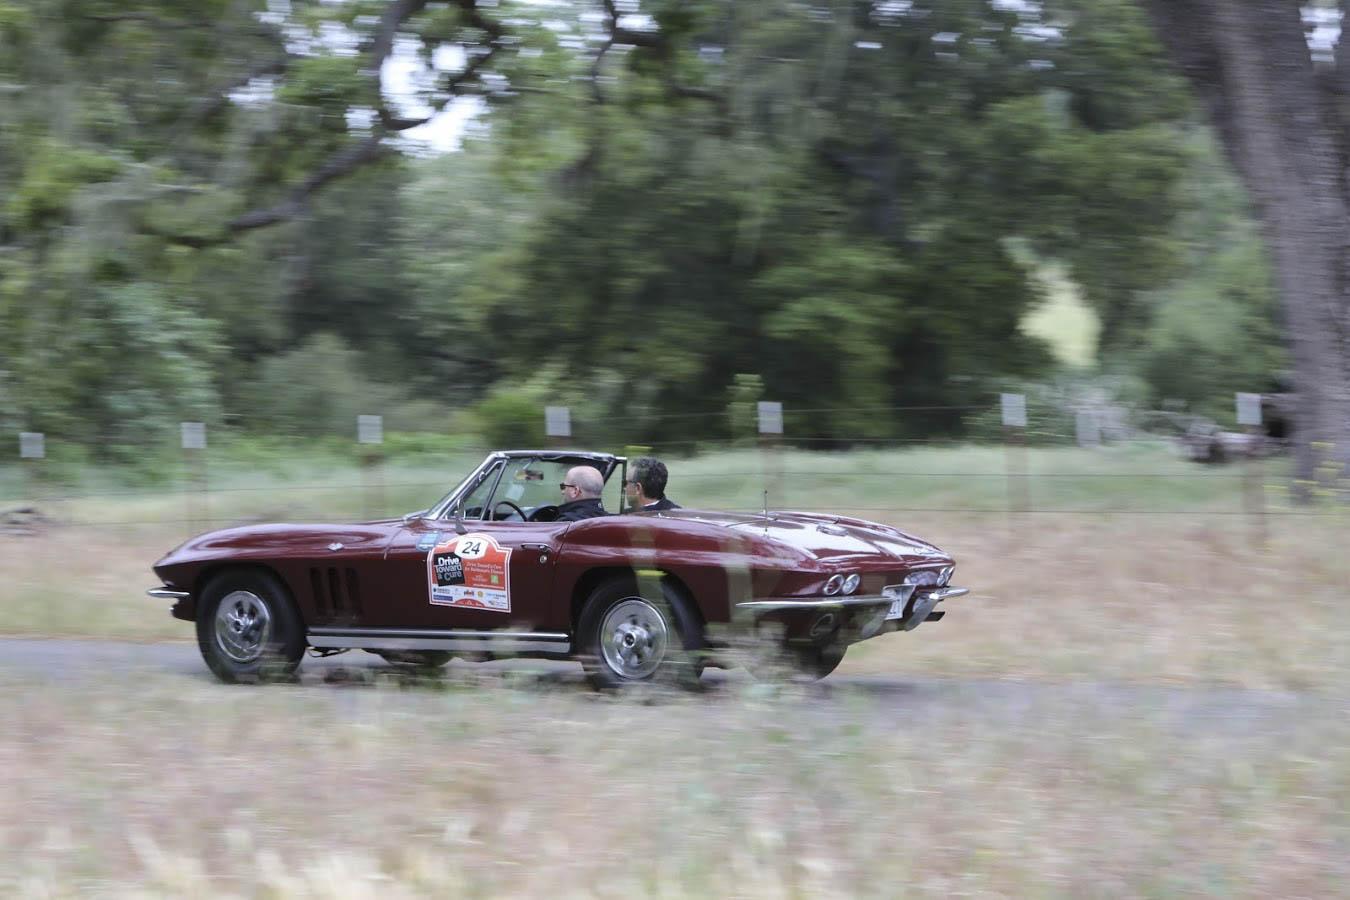 1965 Chevrolet Corvette driving through a field